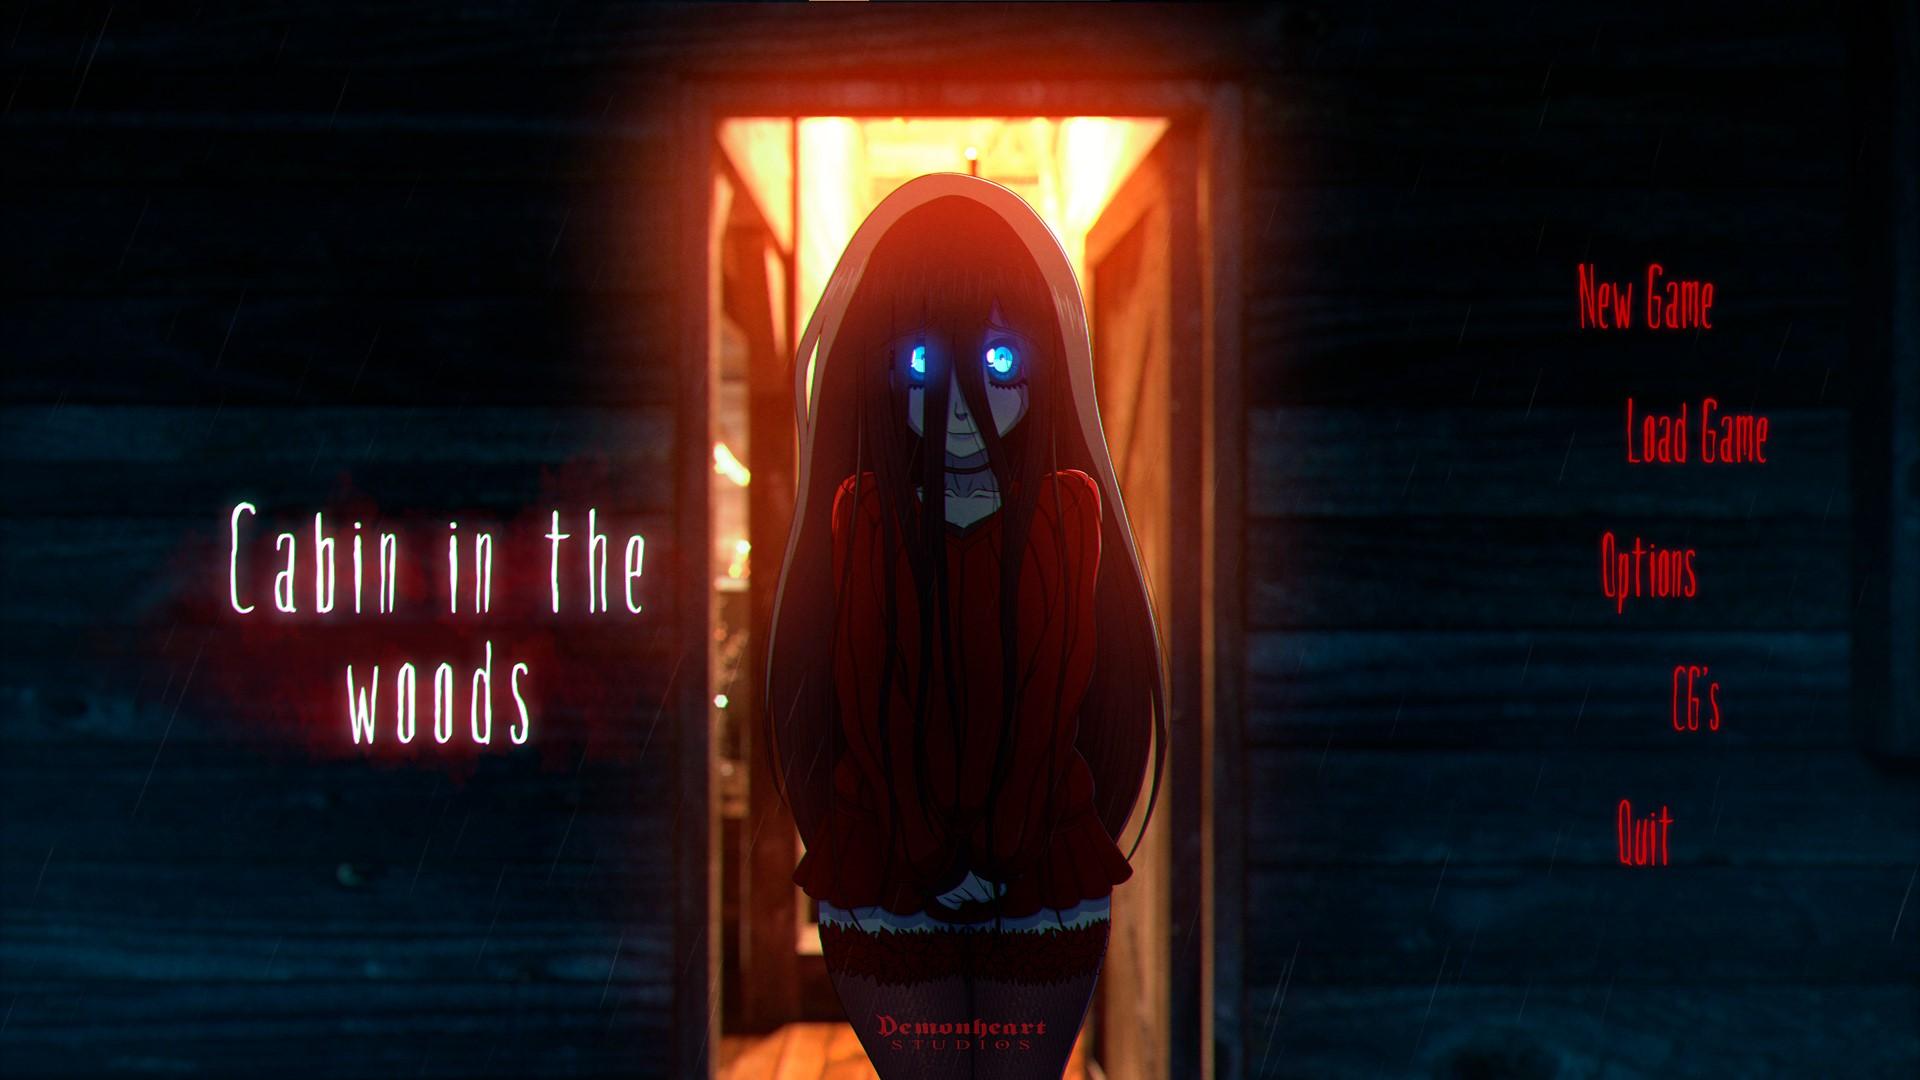 Big tits woods cabin Download Cabin In The Woods Version Final Lewd Ninja